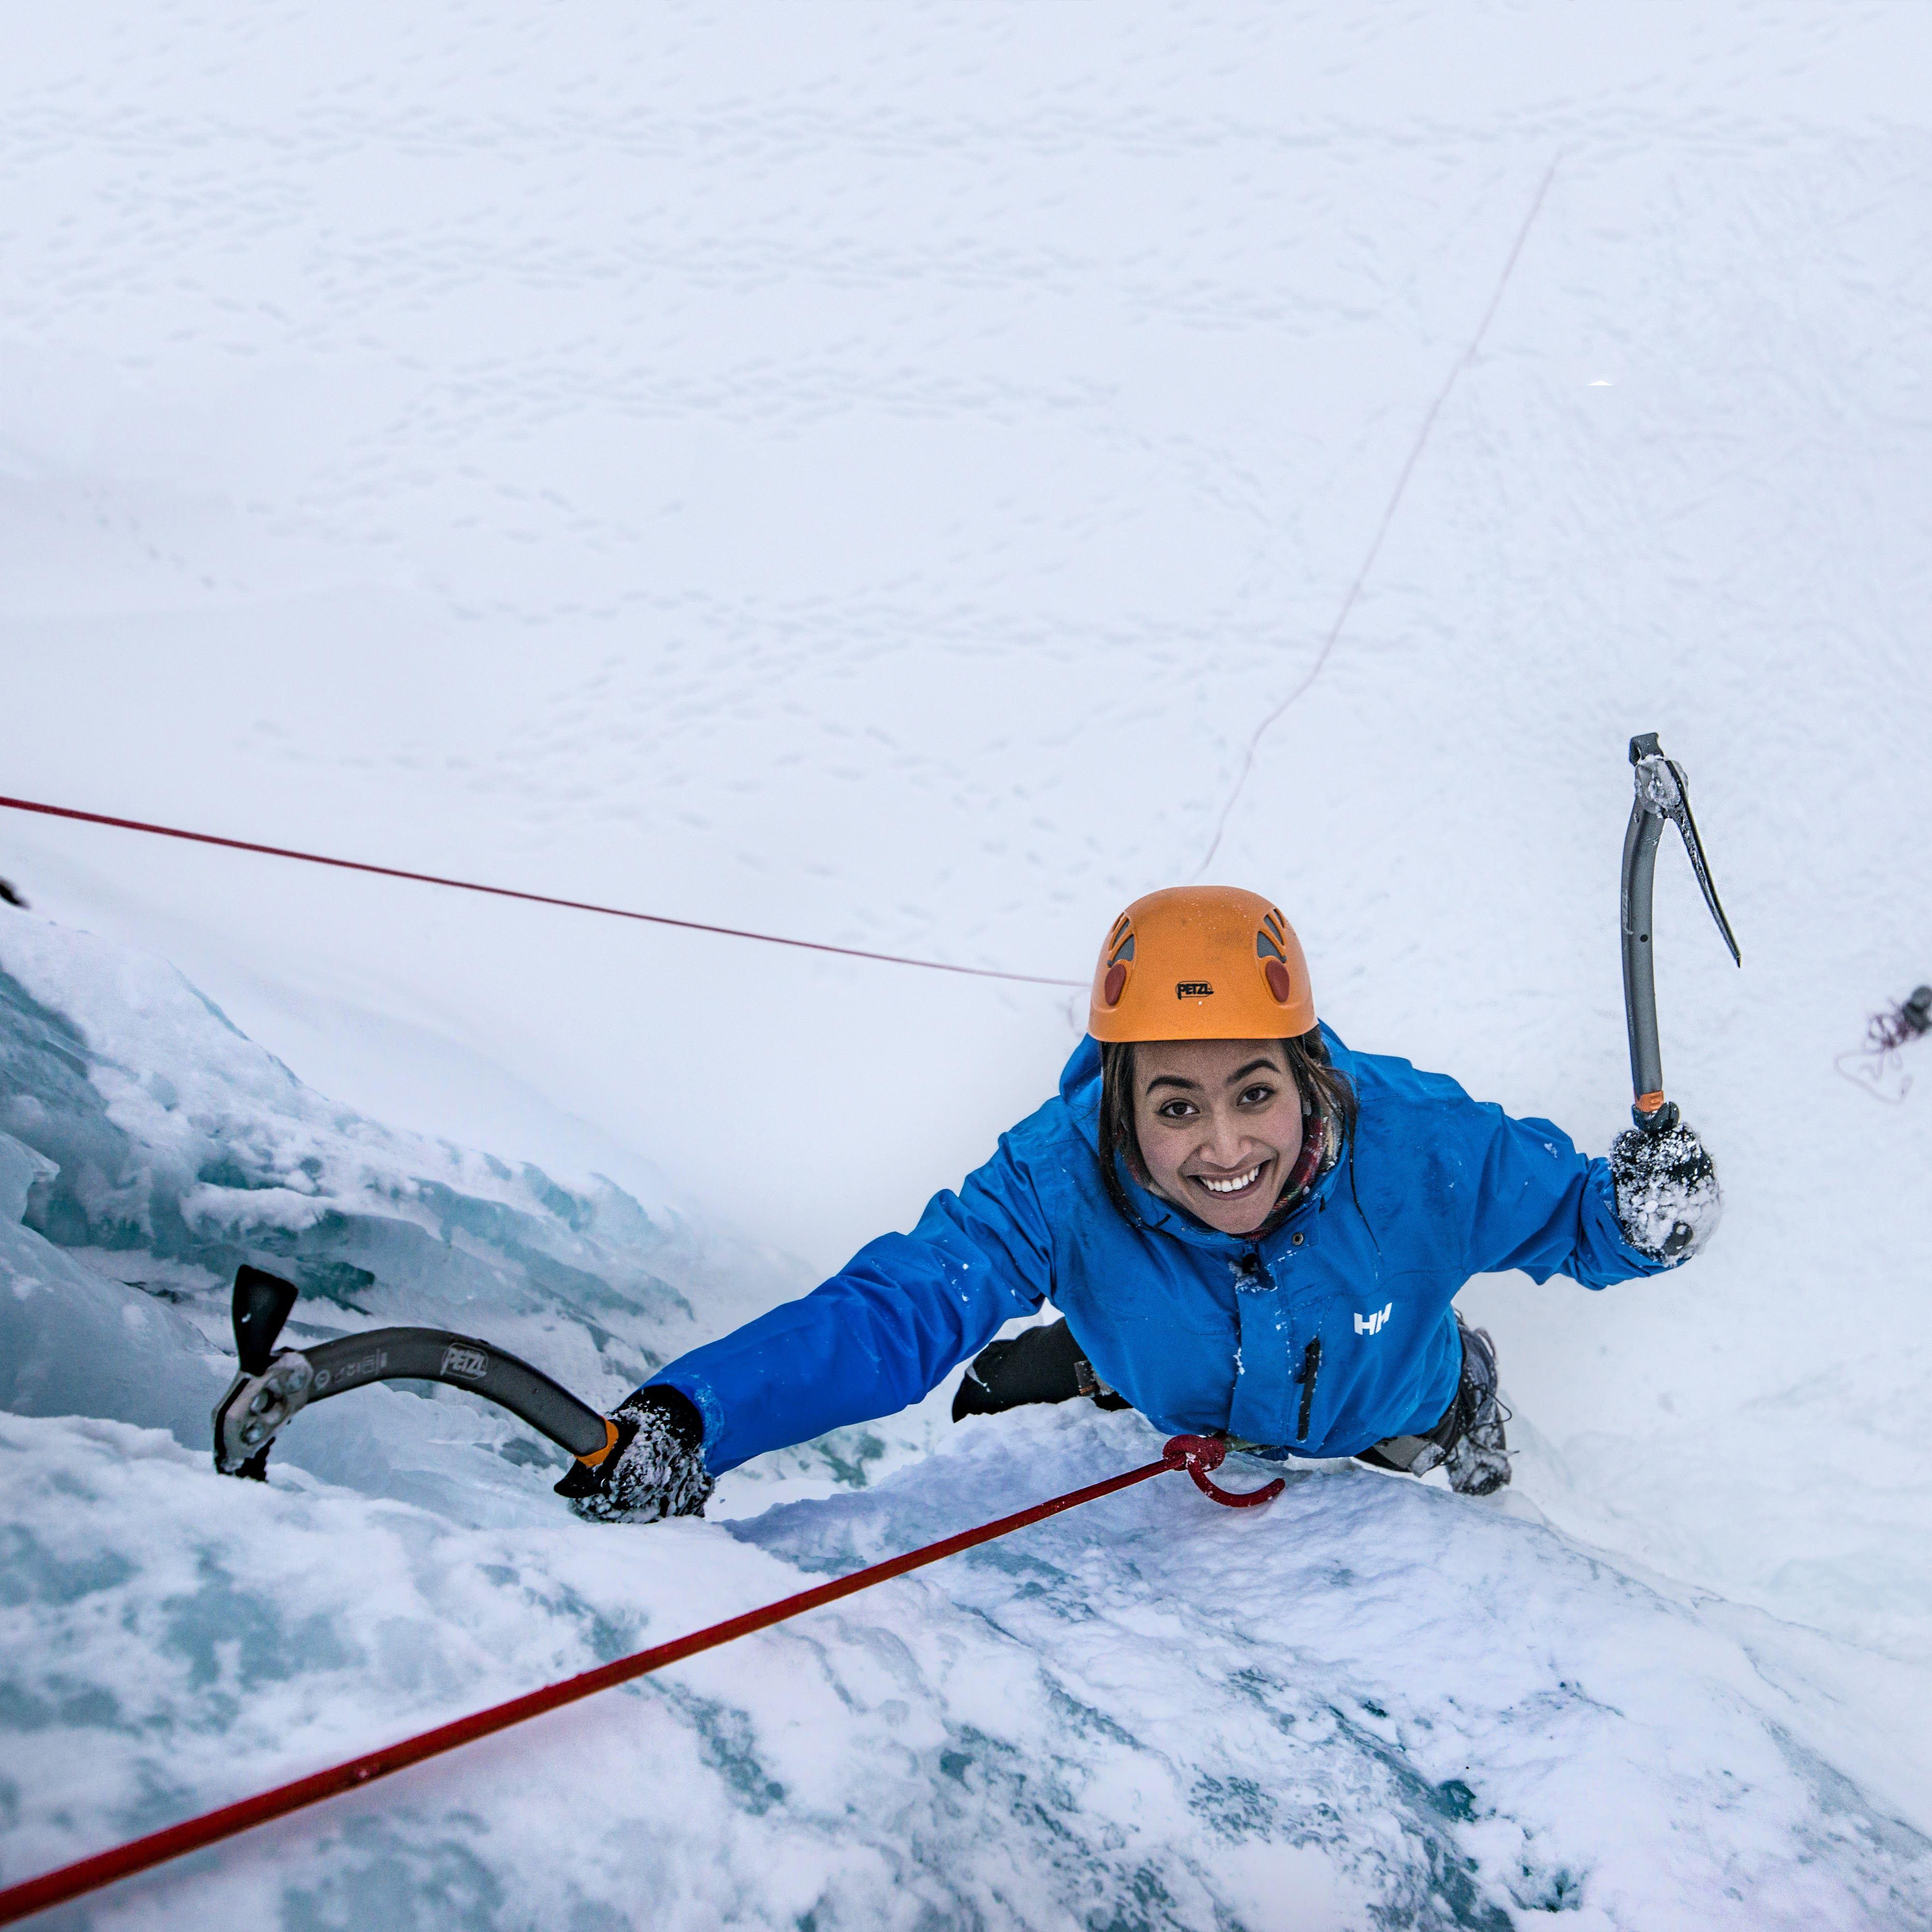 Ice Climbing - Departure Lyngseidet 10:45.